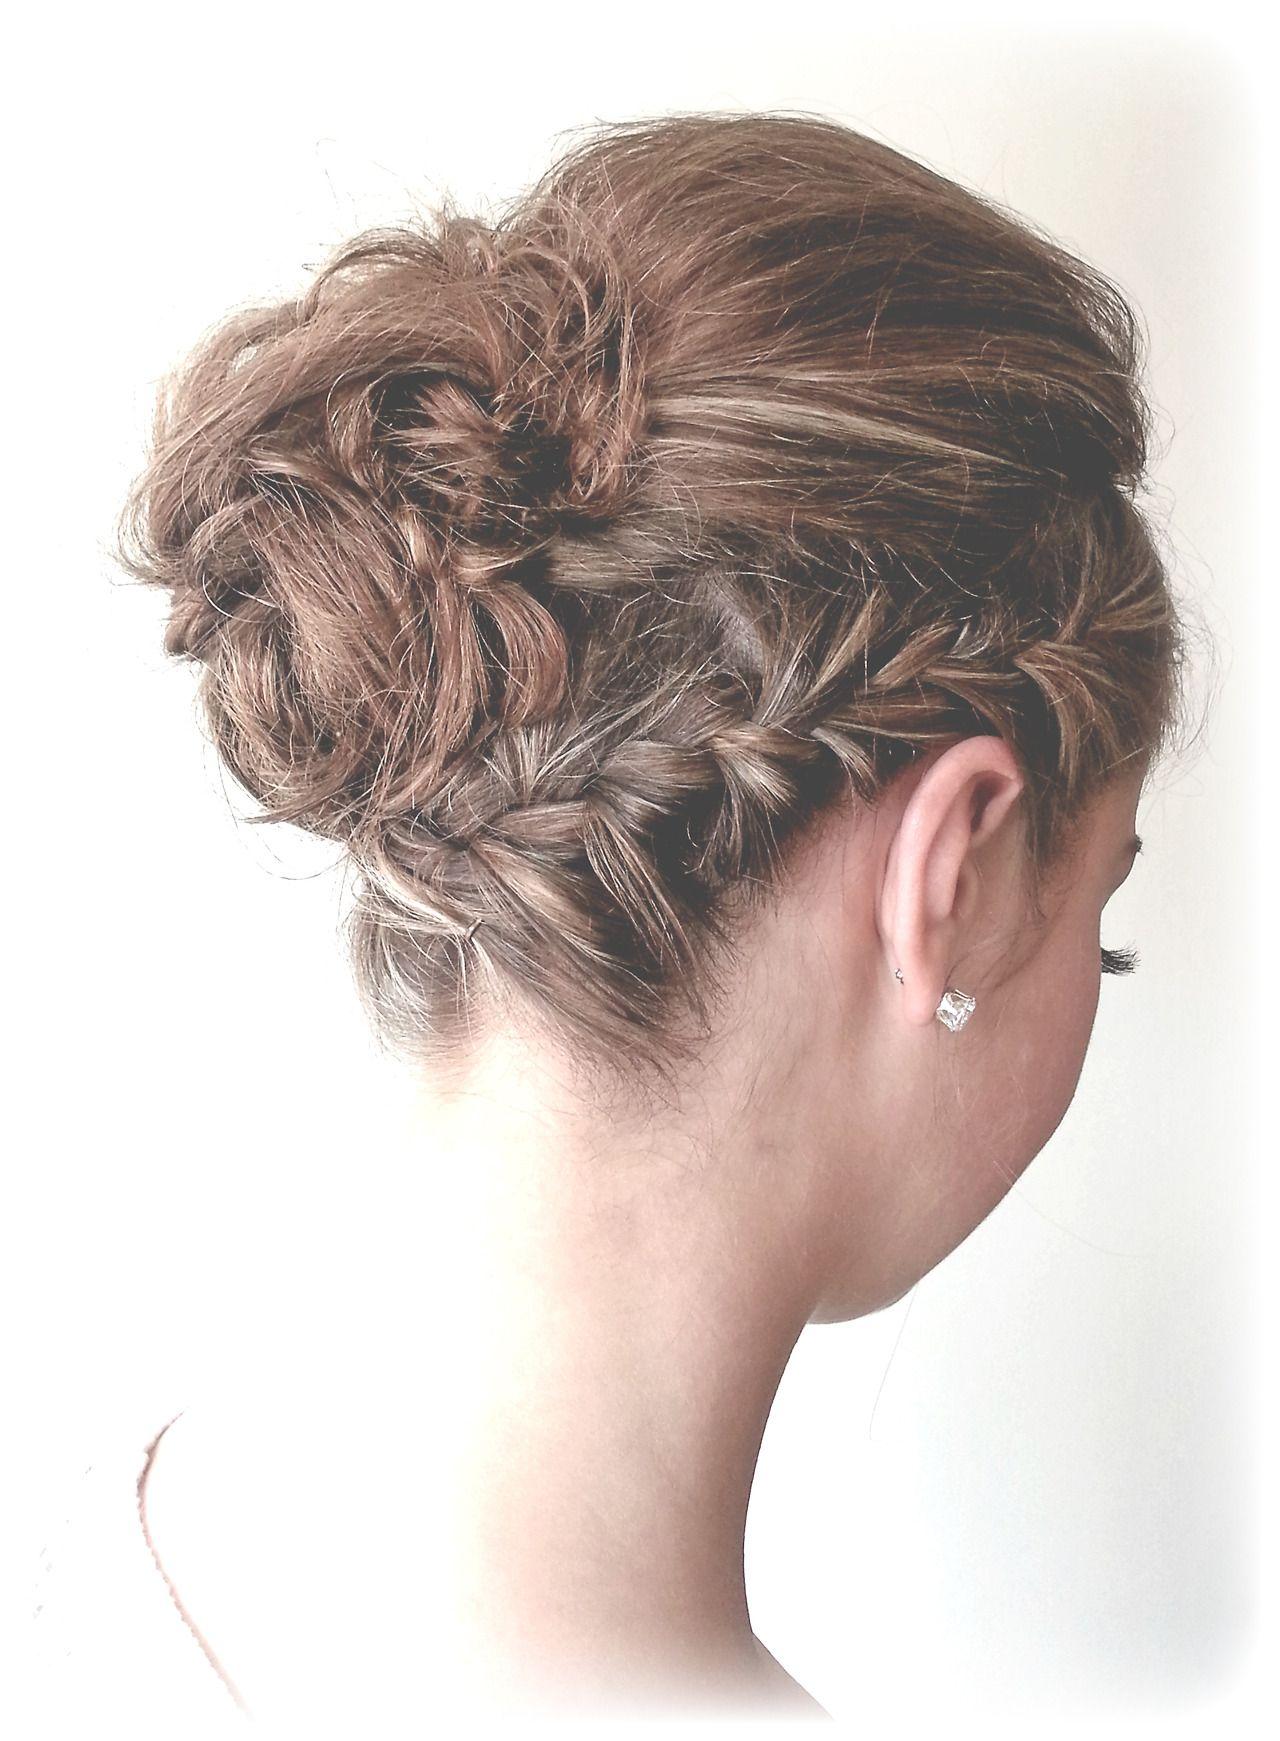 Braided Updos Wedding Hairstyle Updos Hairstyles Weddinghair Orta Uzunlukta Sac Stilleri Dugun Sac Modelleri Dugun Saci